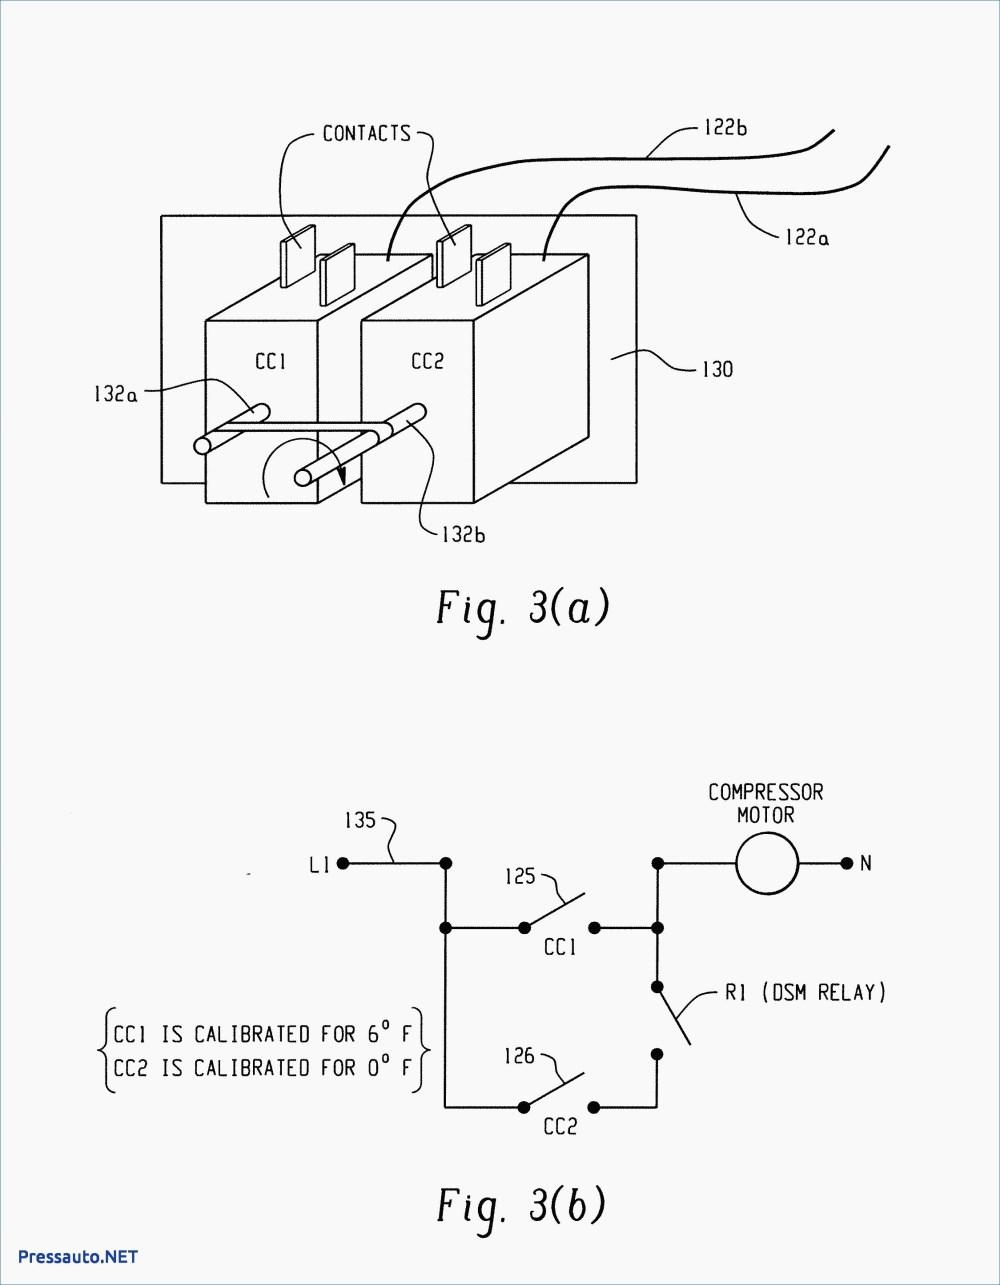 medium resolution of 3 wire pressure transducer wiring diagram 3 wire pressure transducer wiring diagram luxury series 2